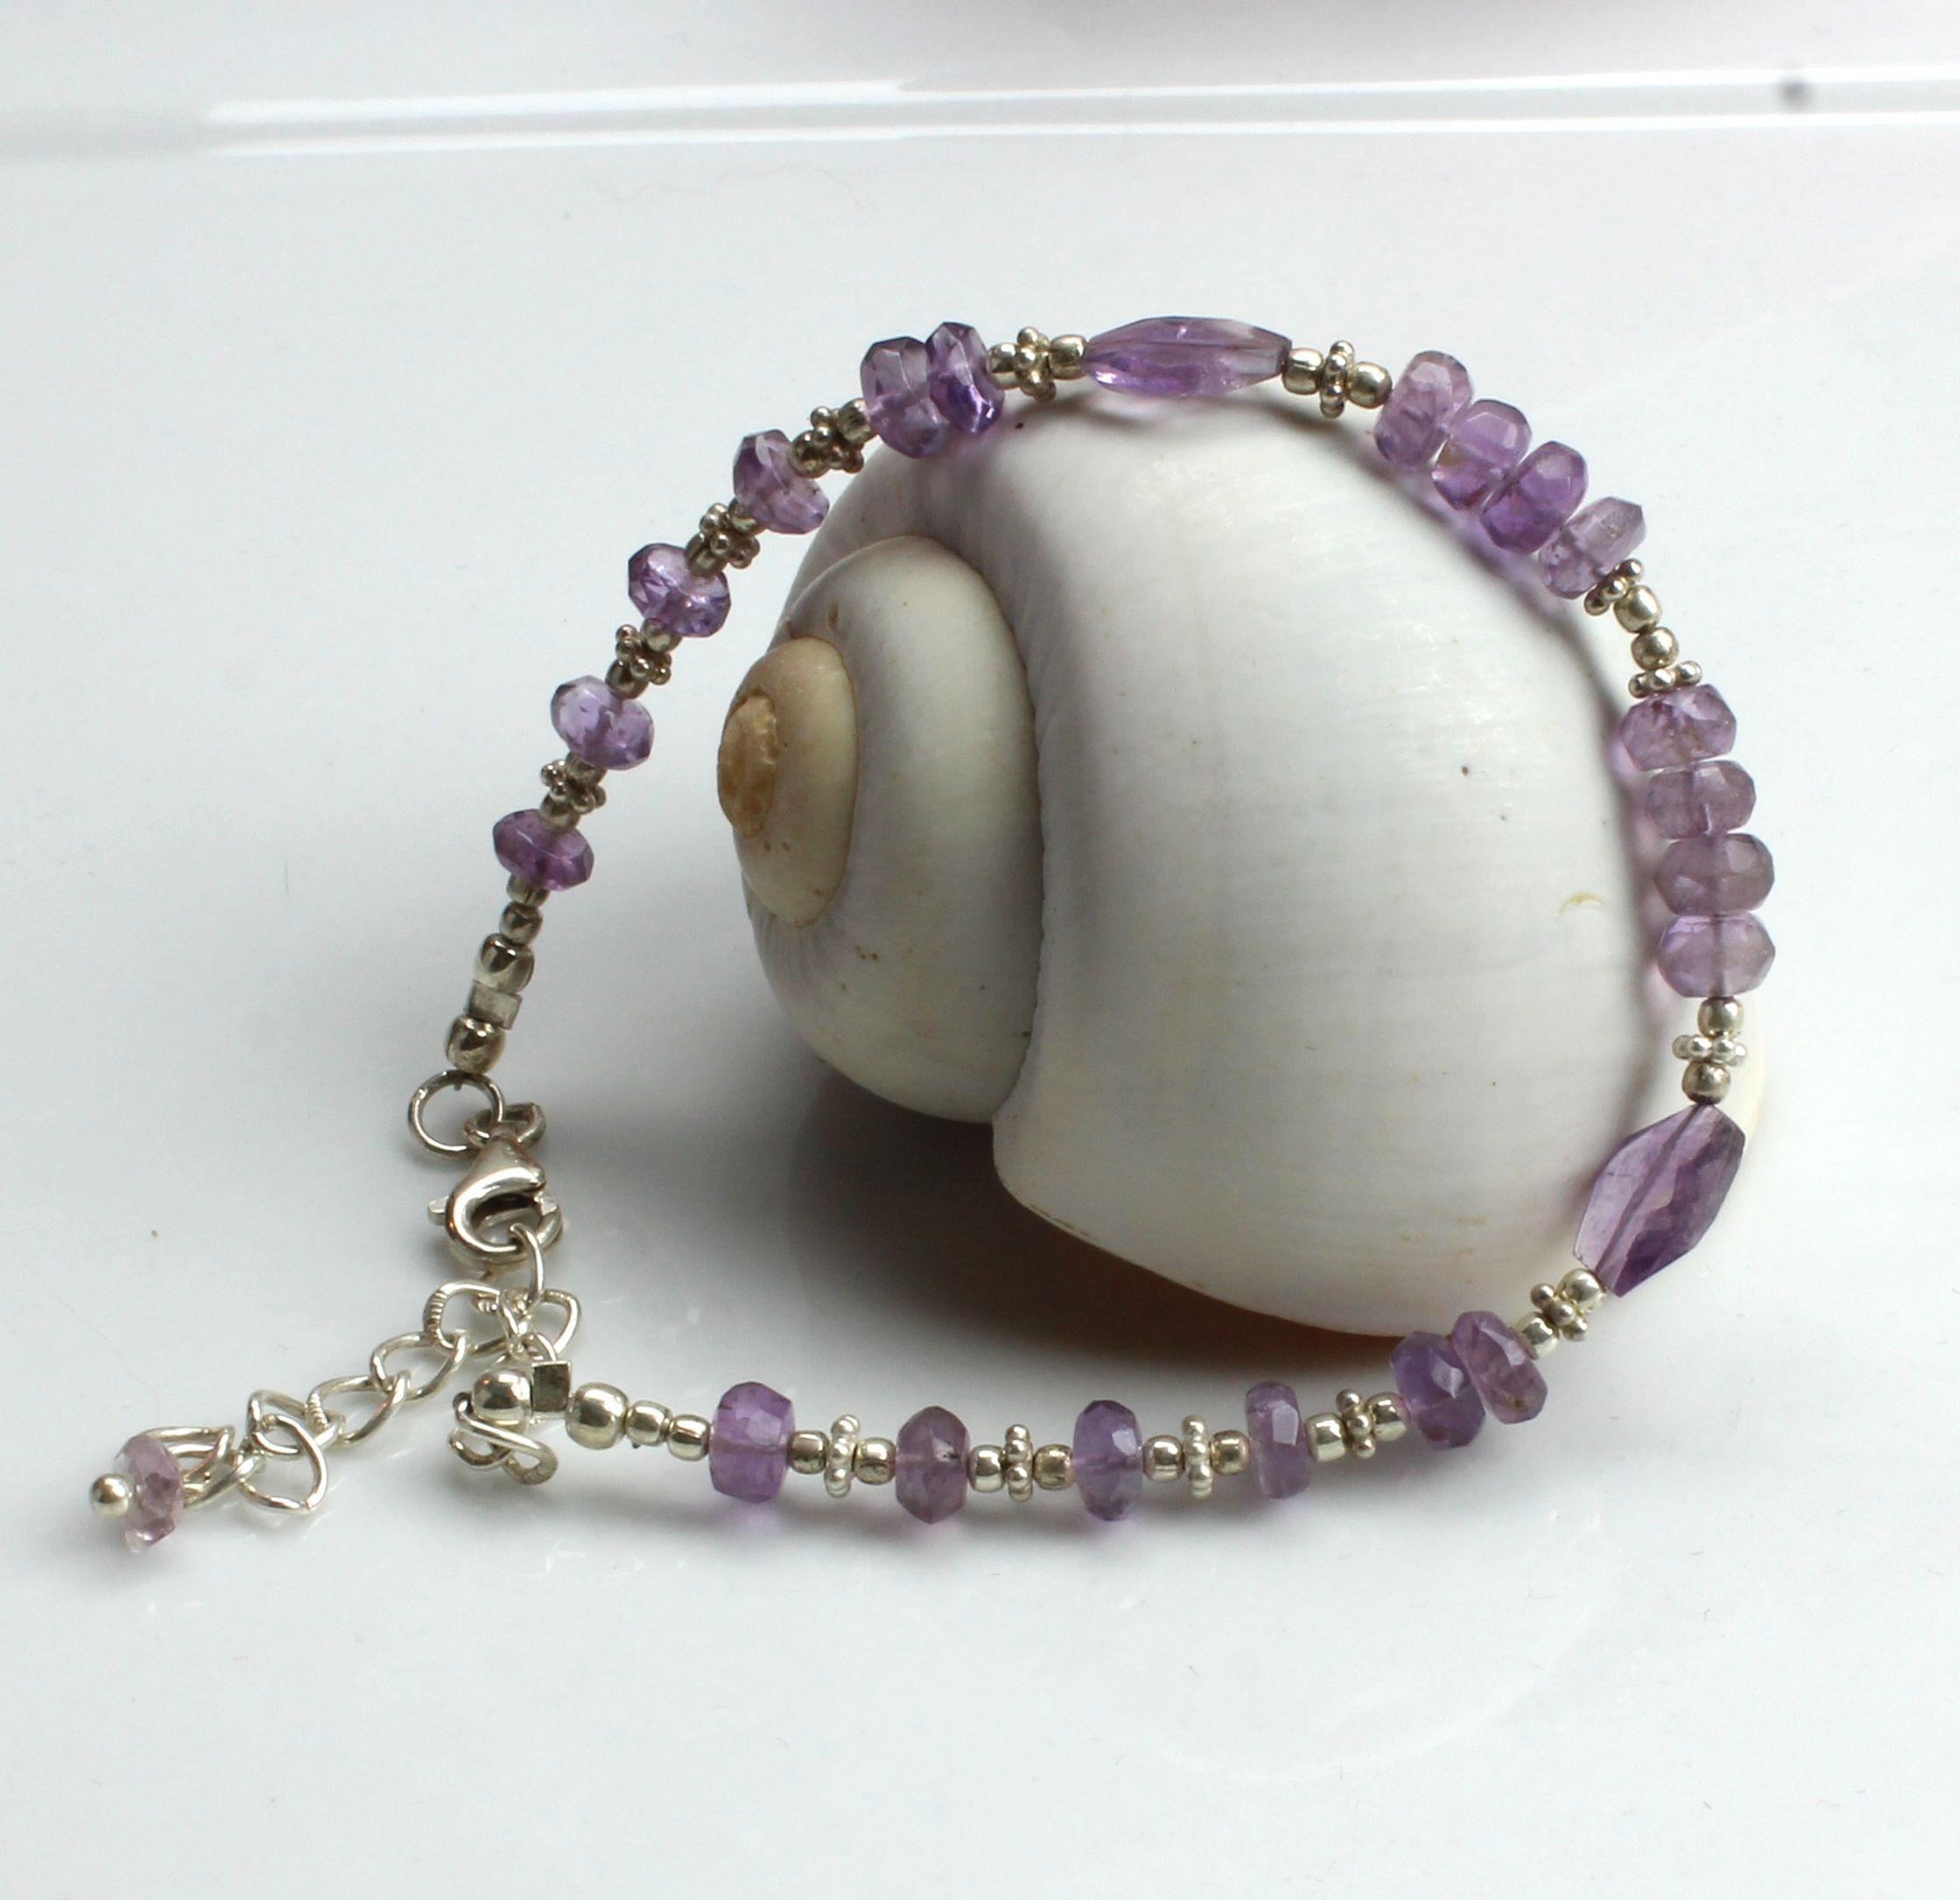 Purple Amethyst Bracelet Found At www.kimberlyhahnstreasures.com